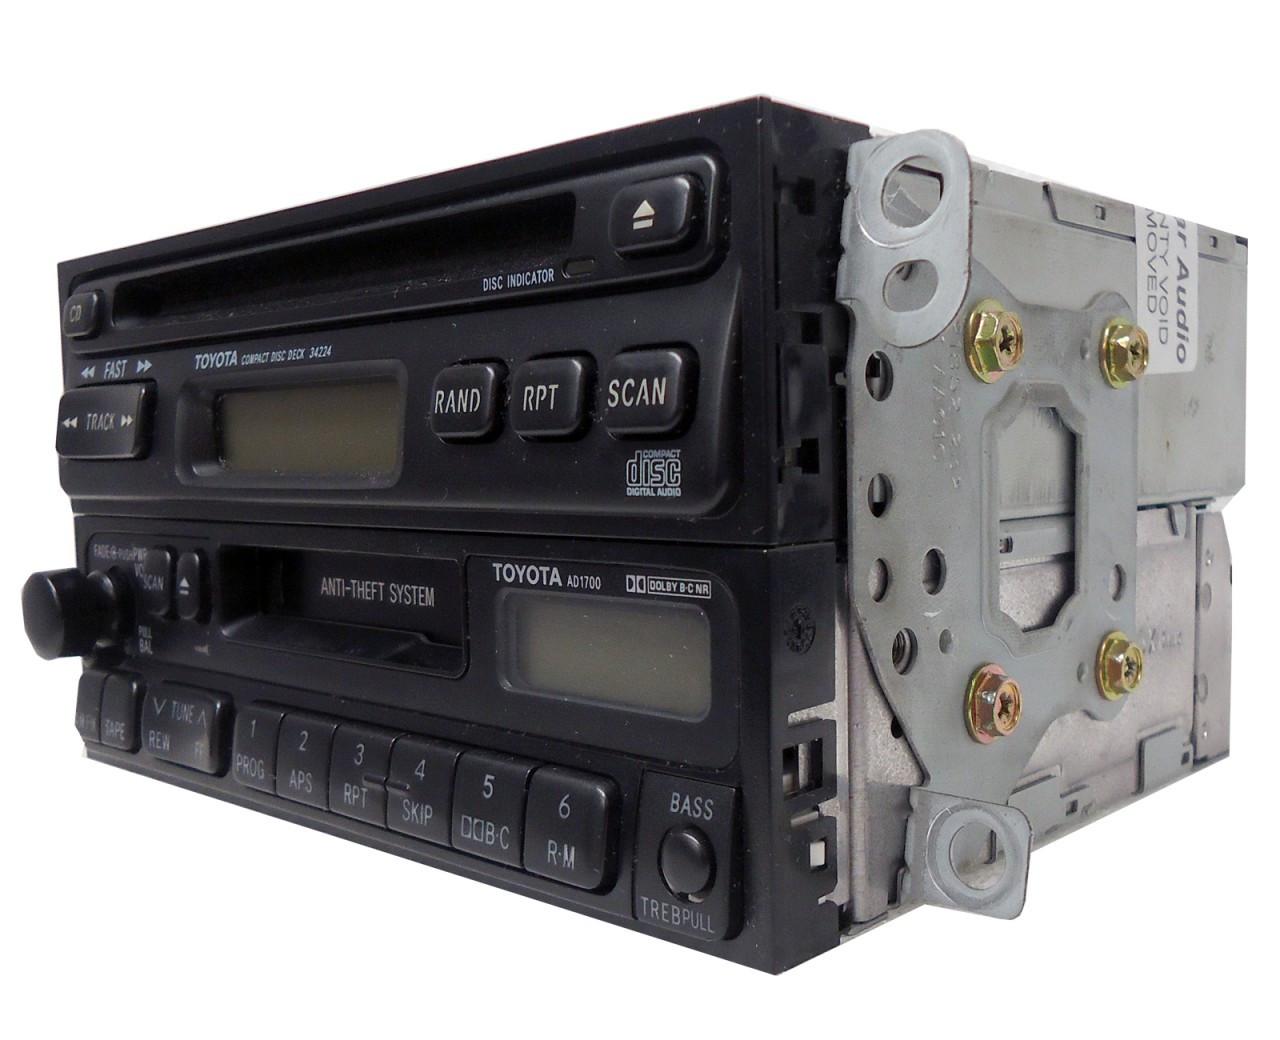 medium resolution of  90 91 92 93 94 95 96 97 98 99 toyota celica 4runner camry radio tape